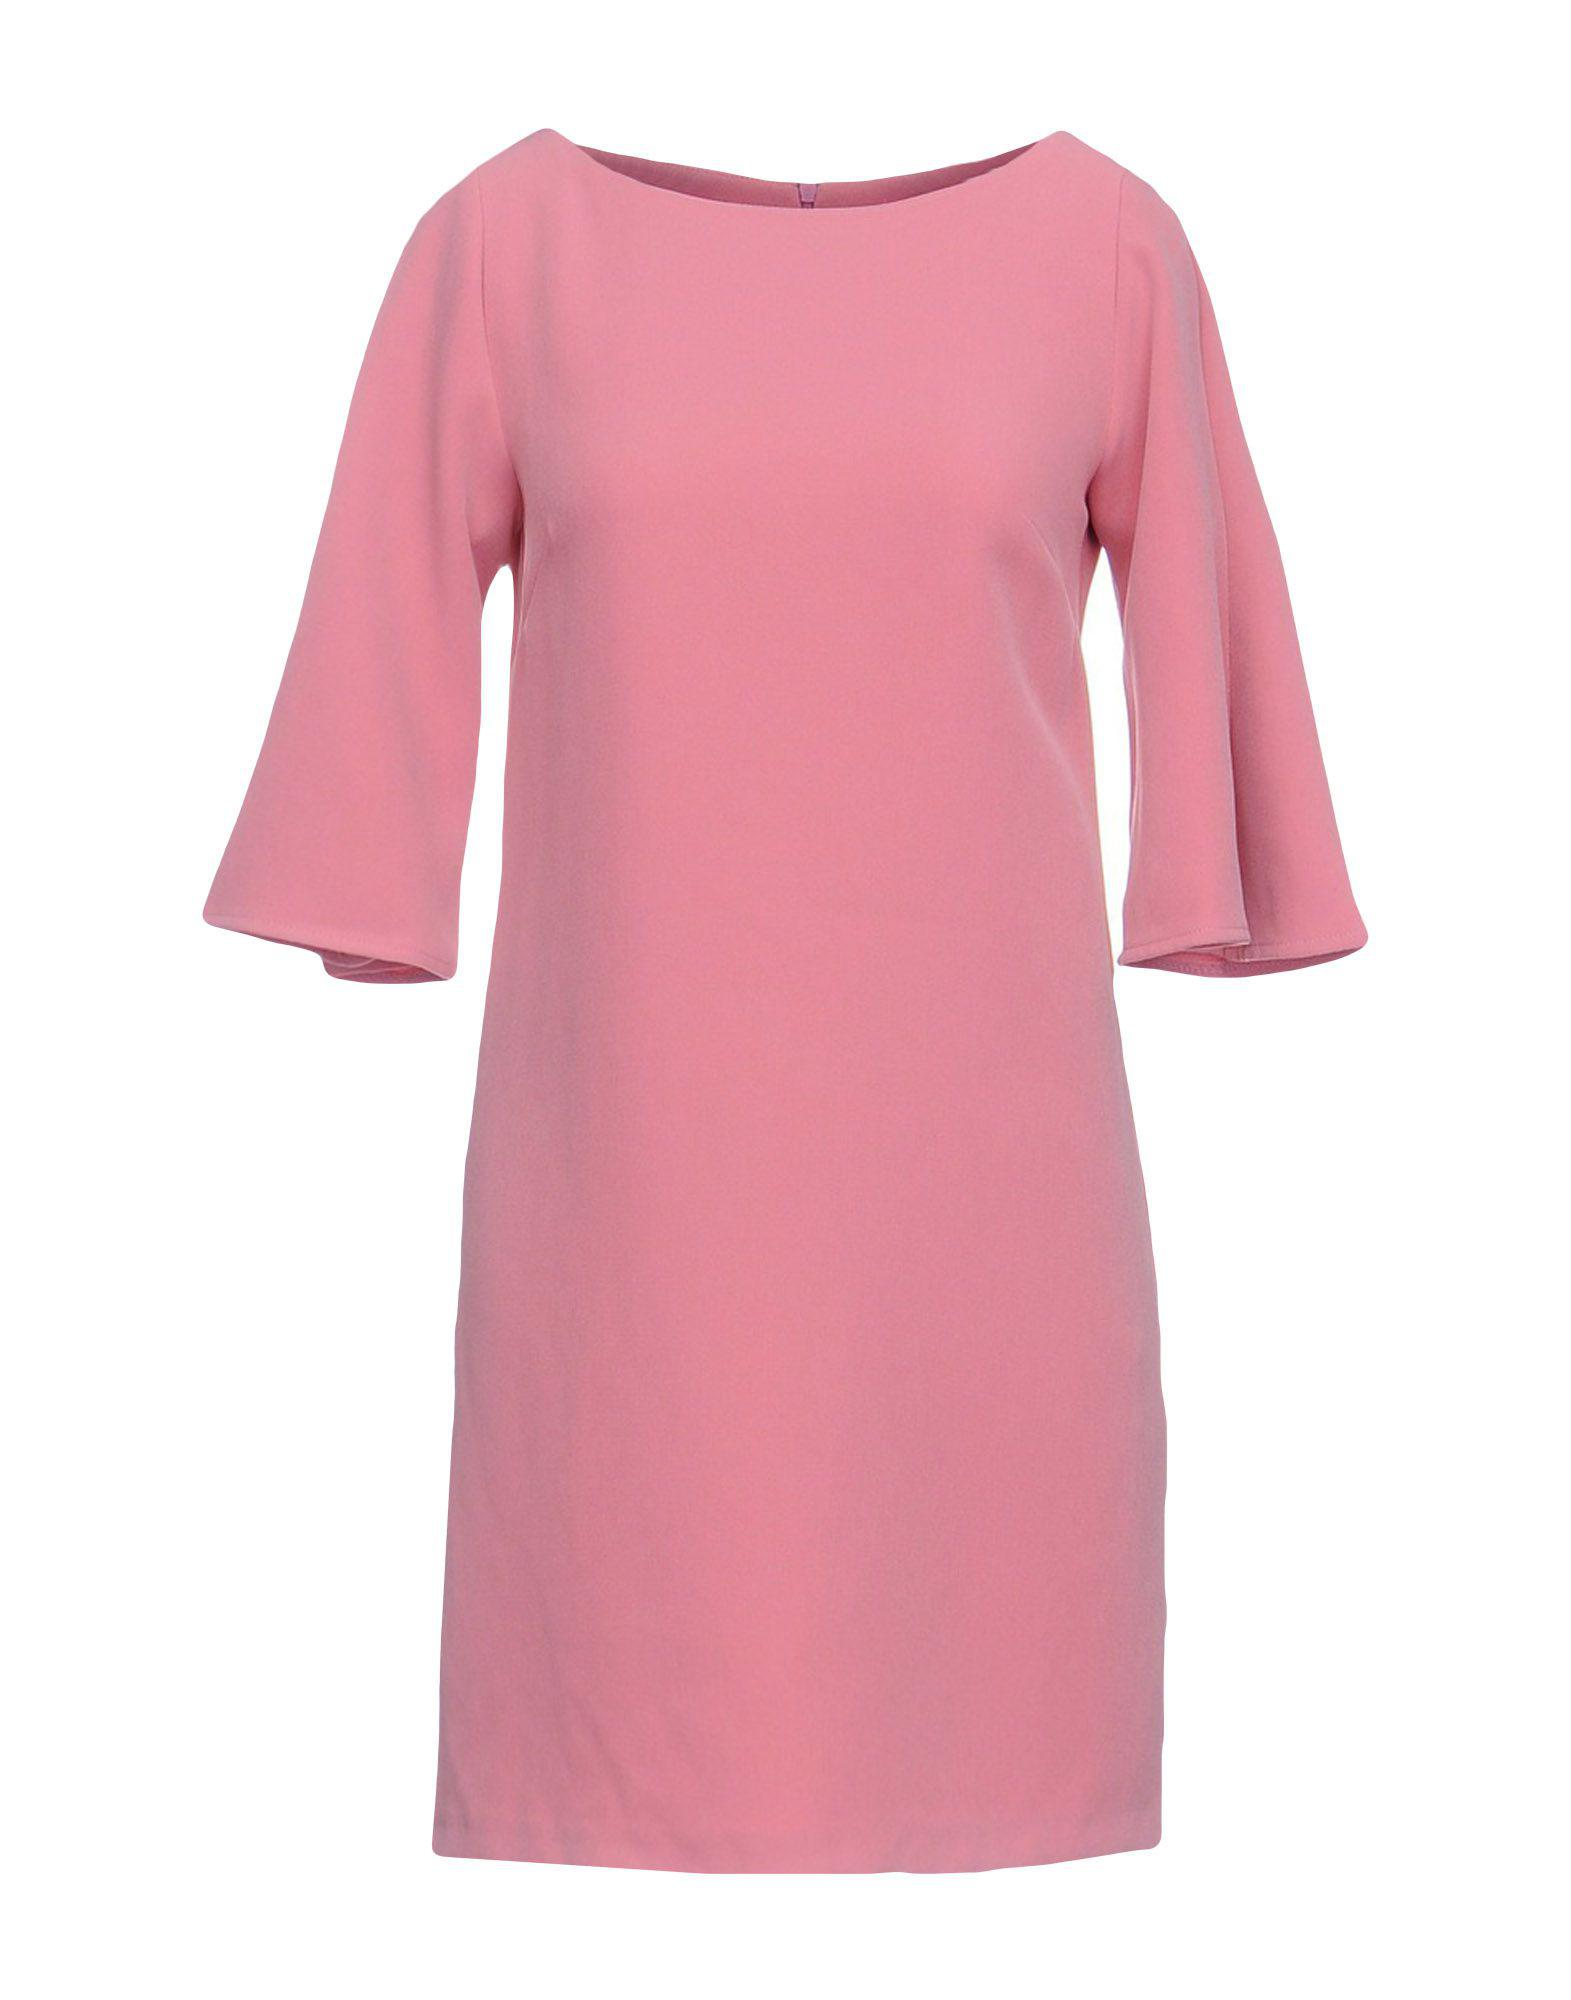 Lyst Twenty Easy By Kaos Short Dress In Pink Dior